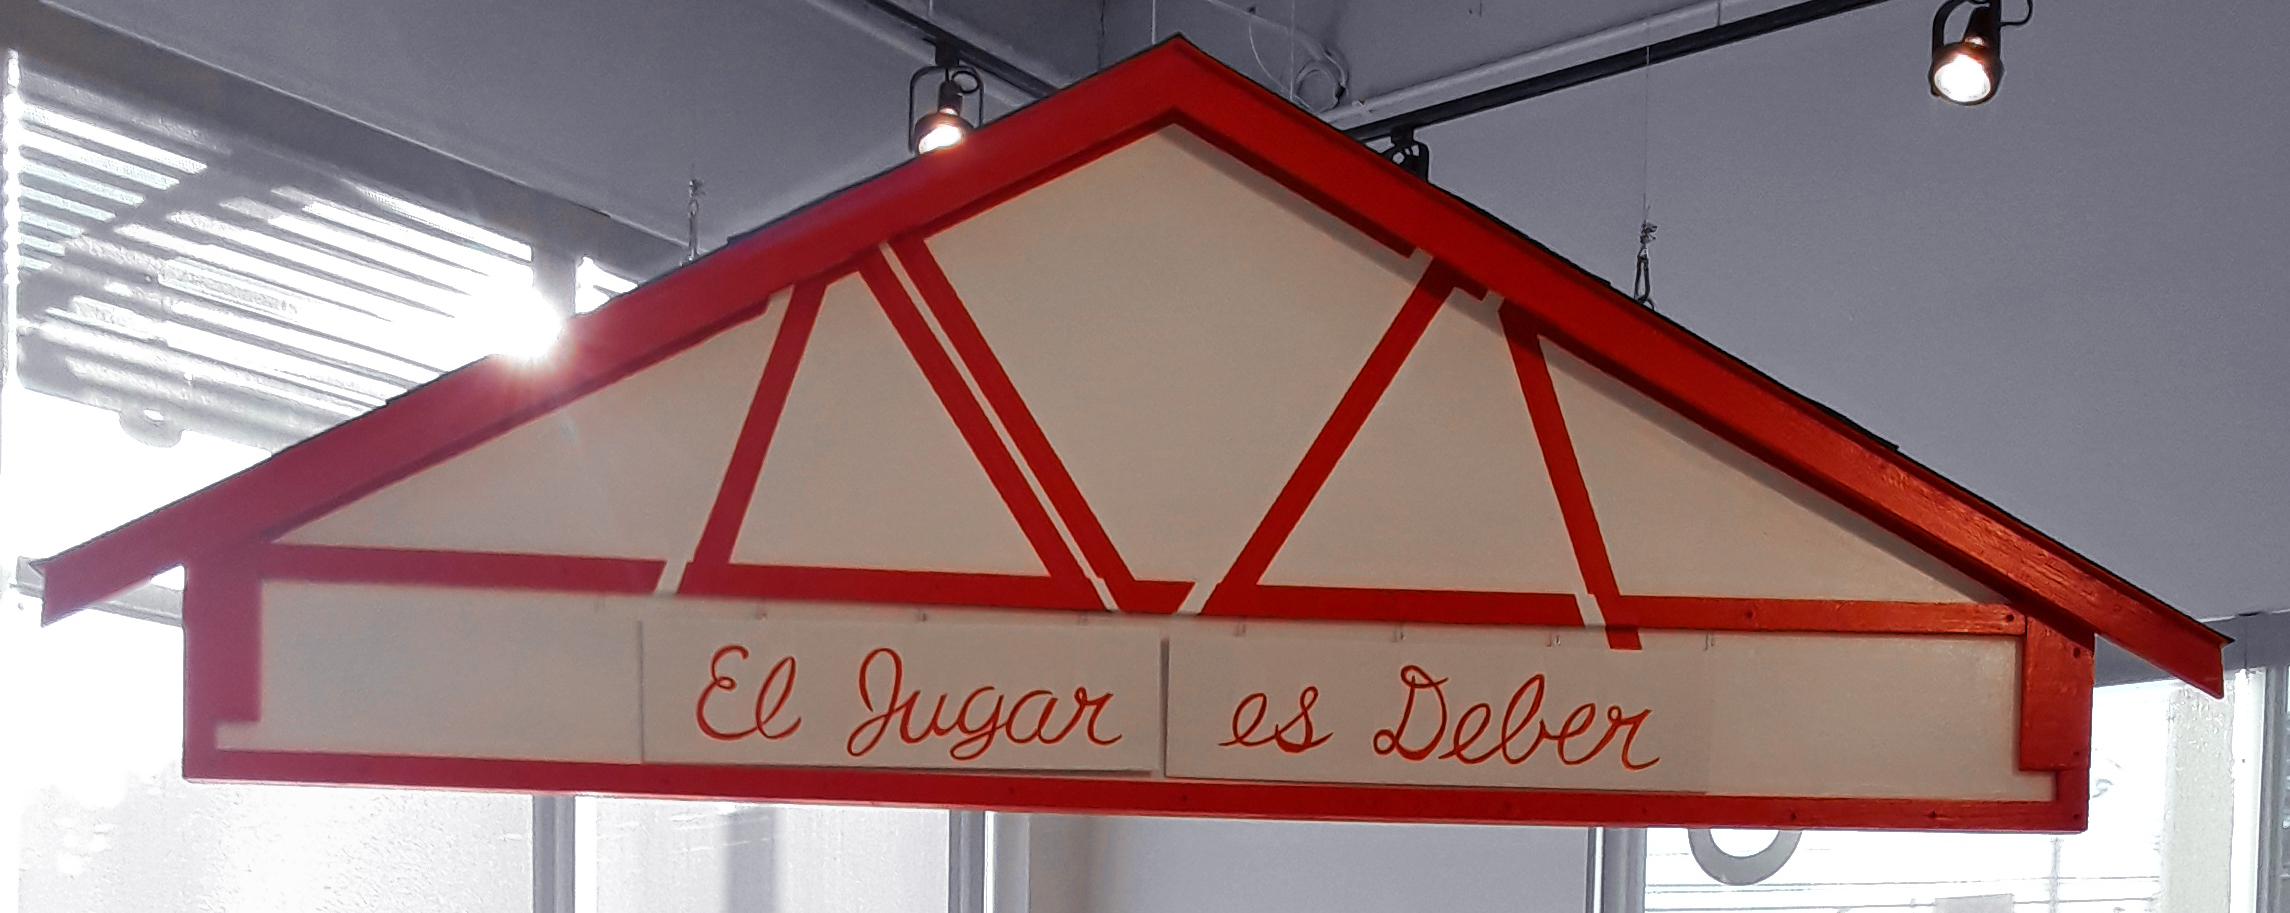 ElJugaresDeber.jpg